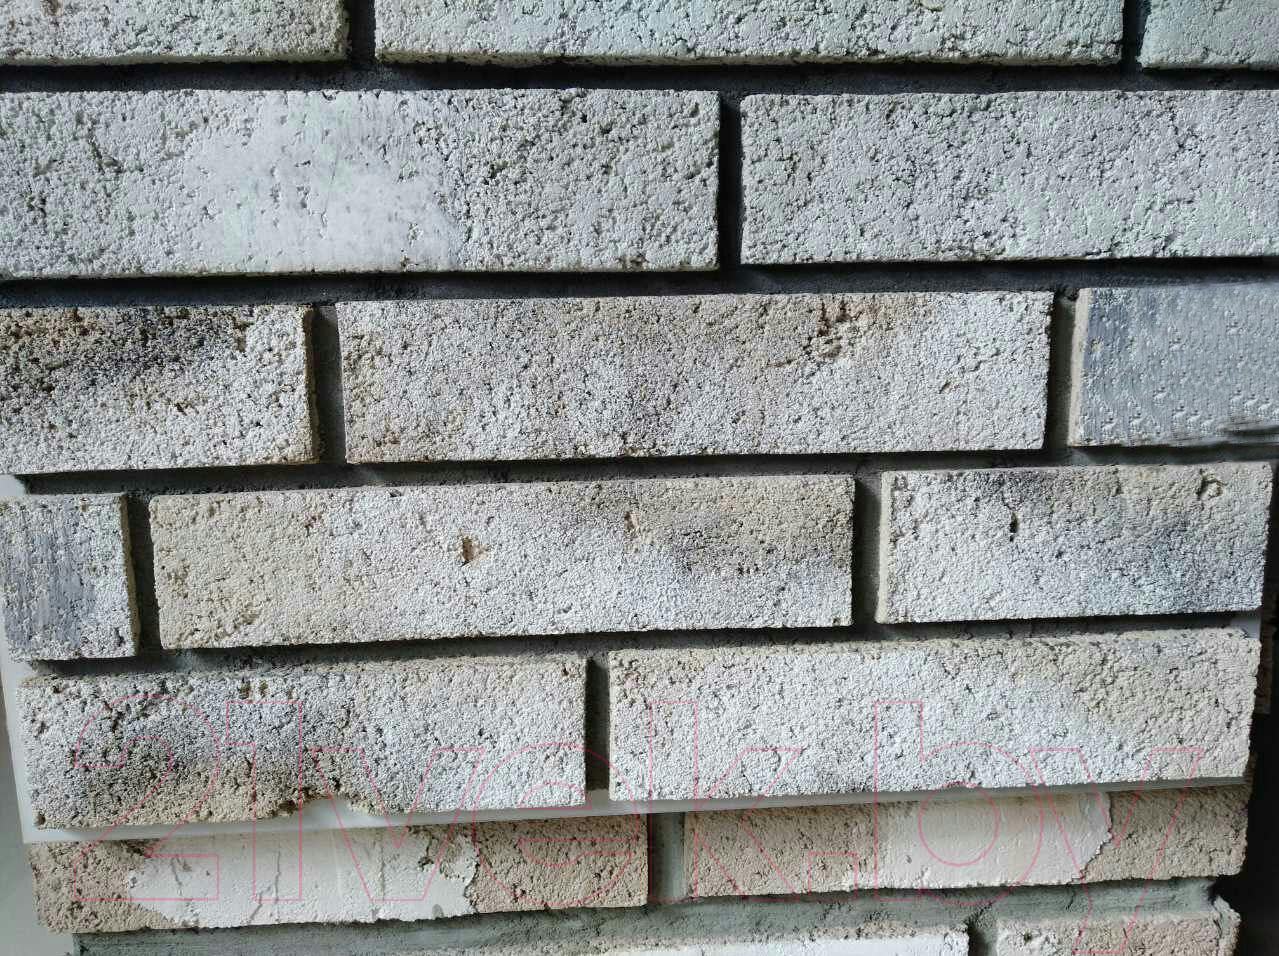 Купить Декоративный камень РокСтоун, Tsegla Рузенбергский кирпич 900П (белый), Беларусь, бетон